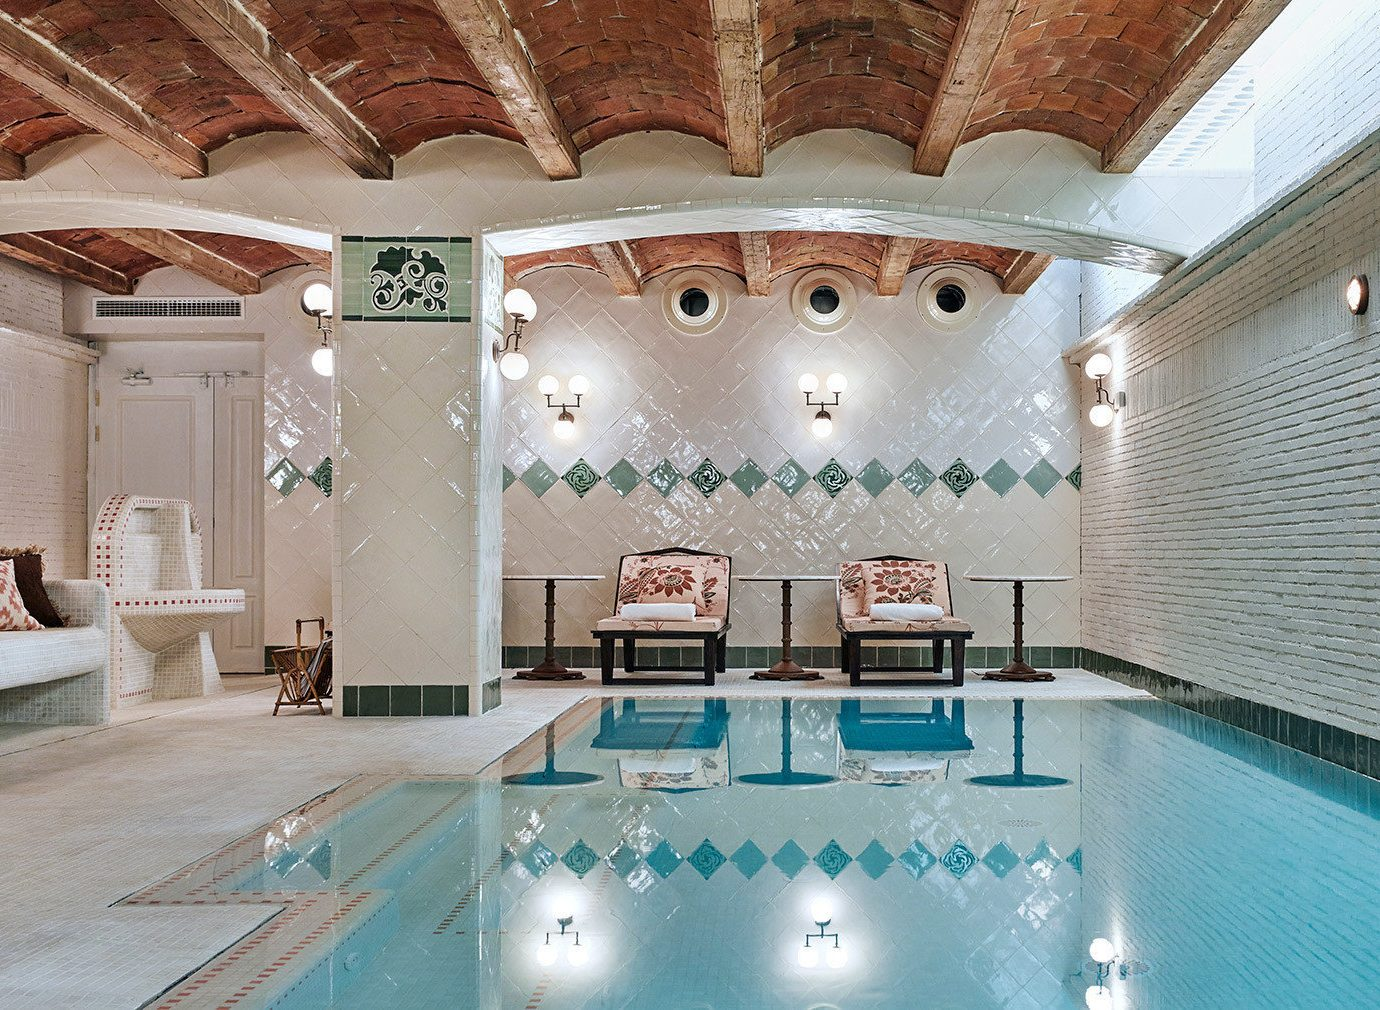 Barcelona Hotels Spain indoor swimming pool estate interior design function hall mansion Lobby Design ceiling